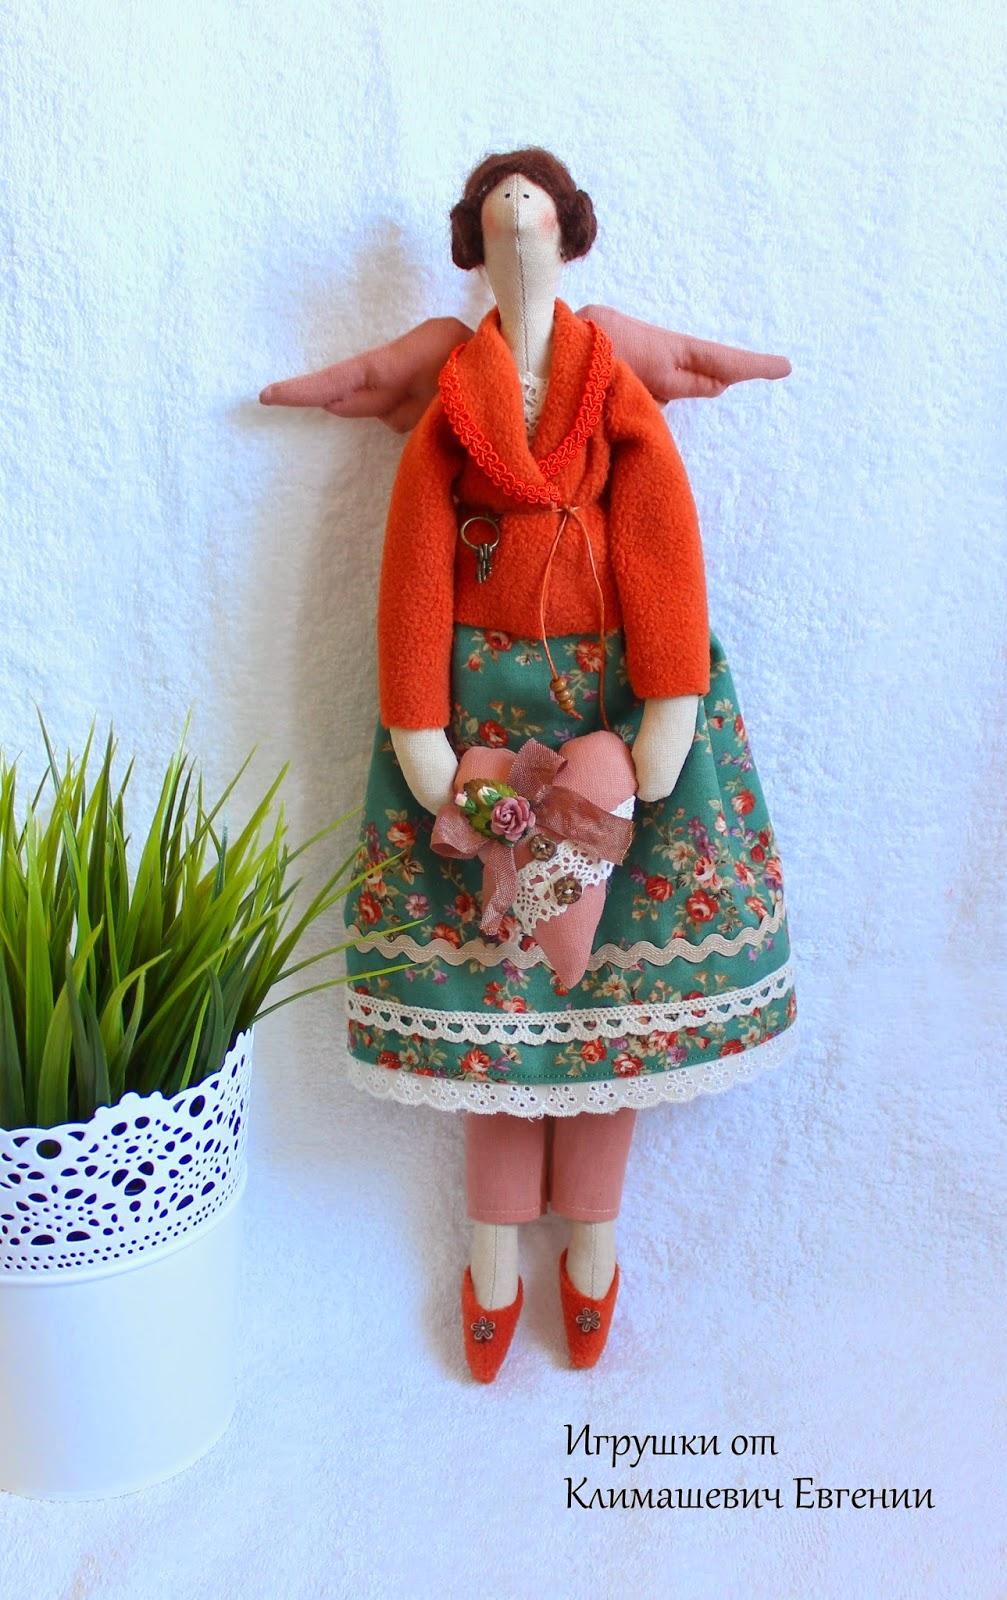 Тильда, кукла тильда, тильда фея, тильда ангел, ангел, фея, кукла своими руками, тильда мк, тильда мастер класс, текстильная кукла